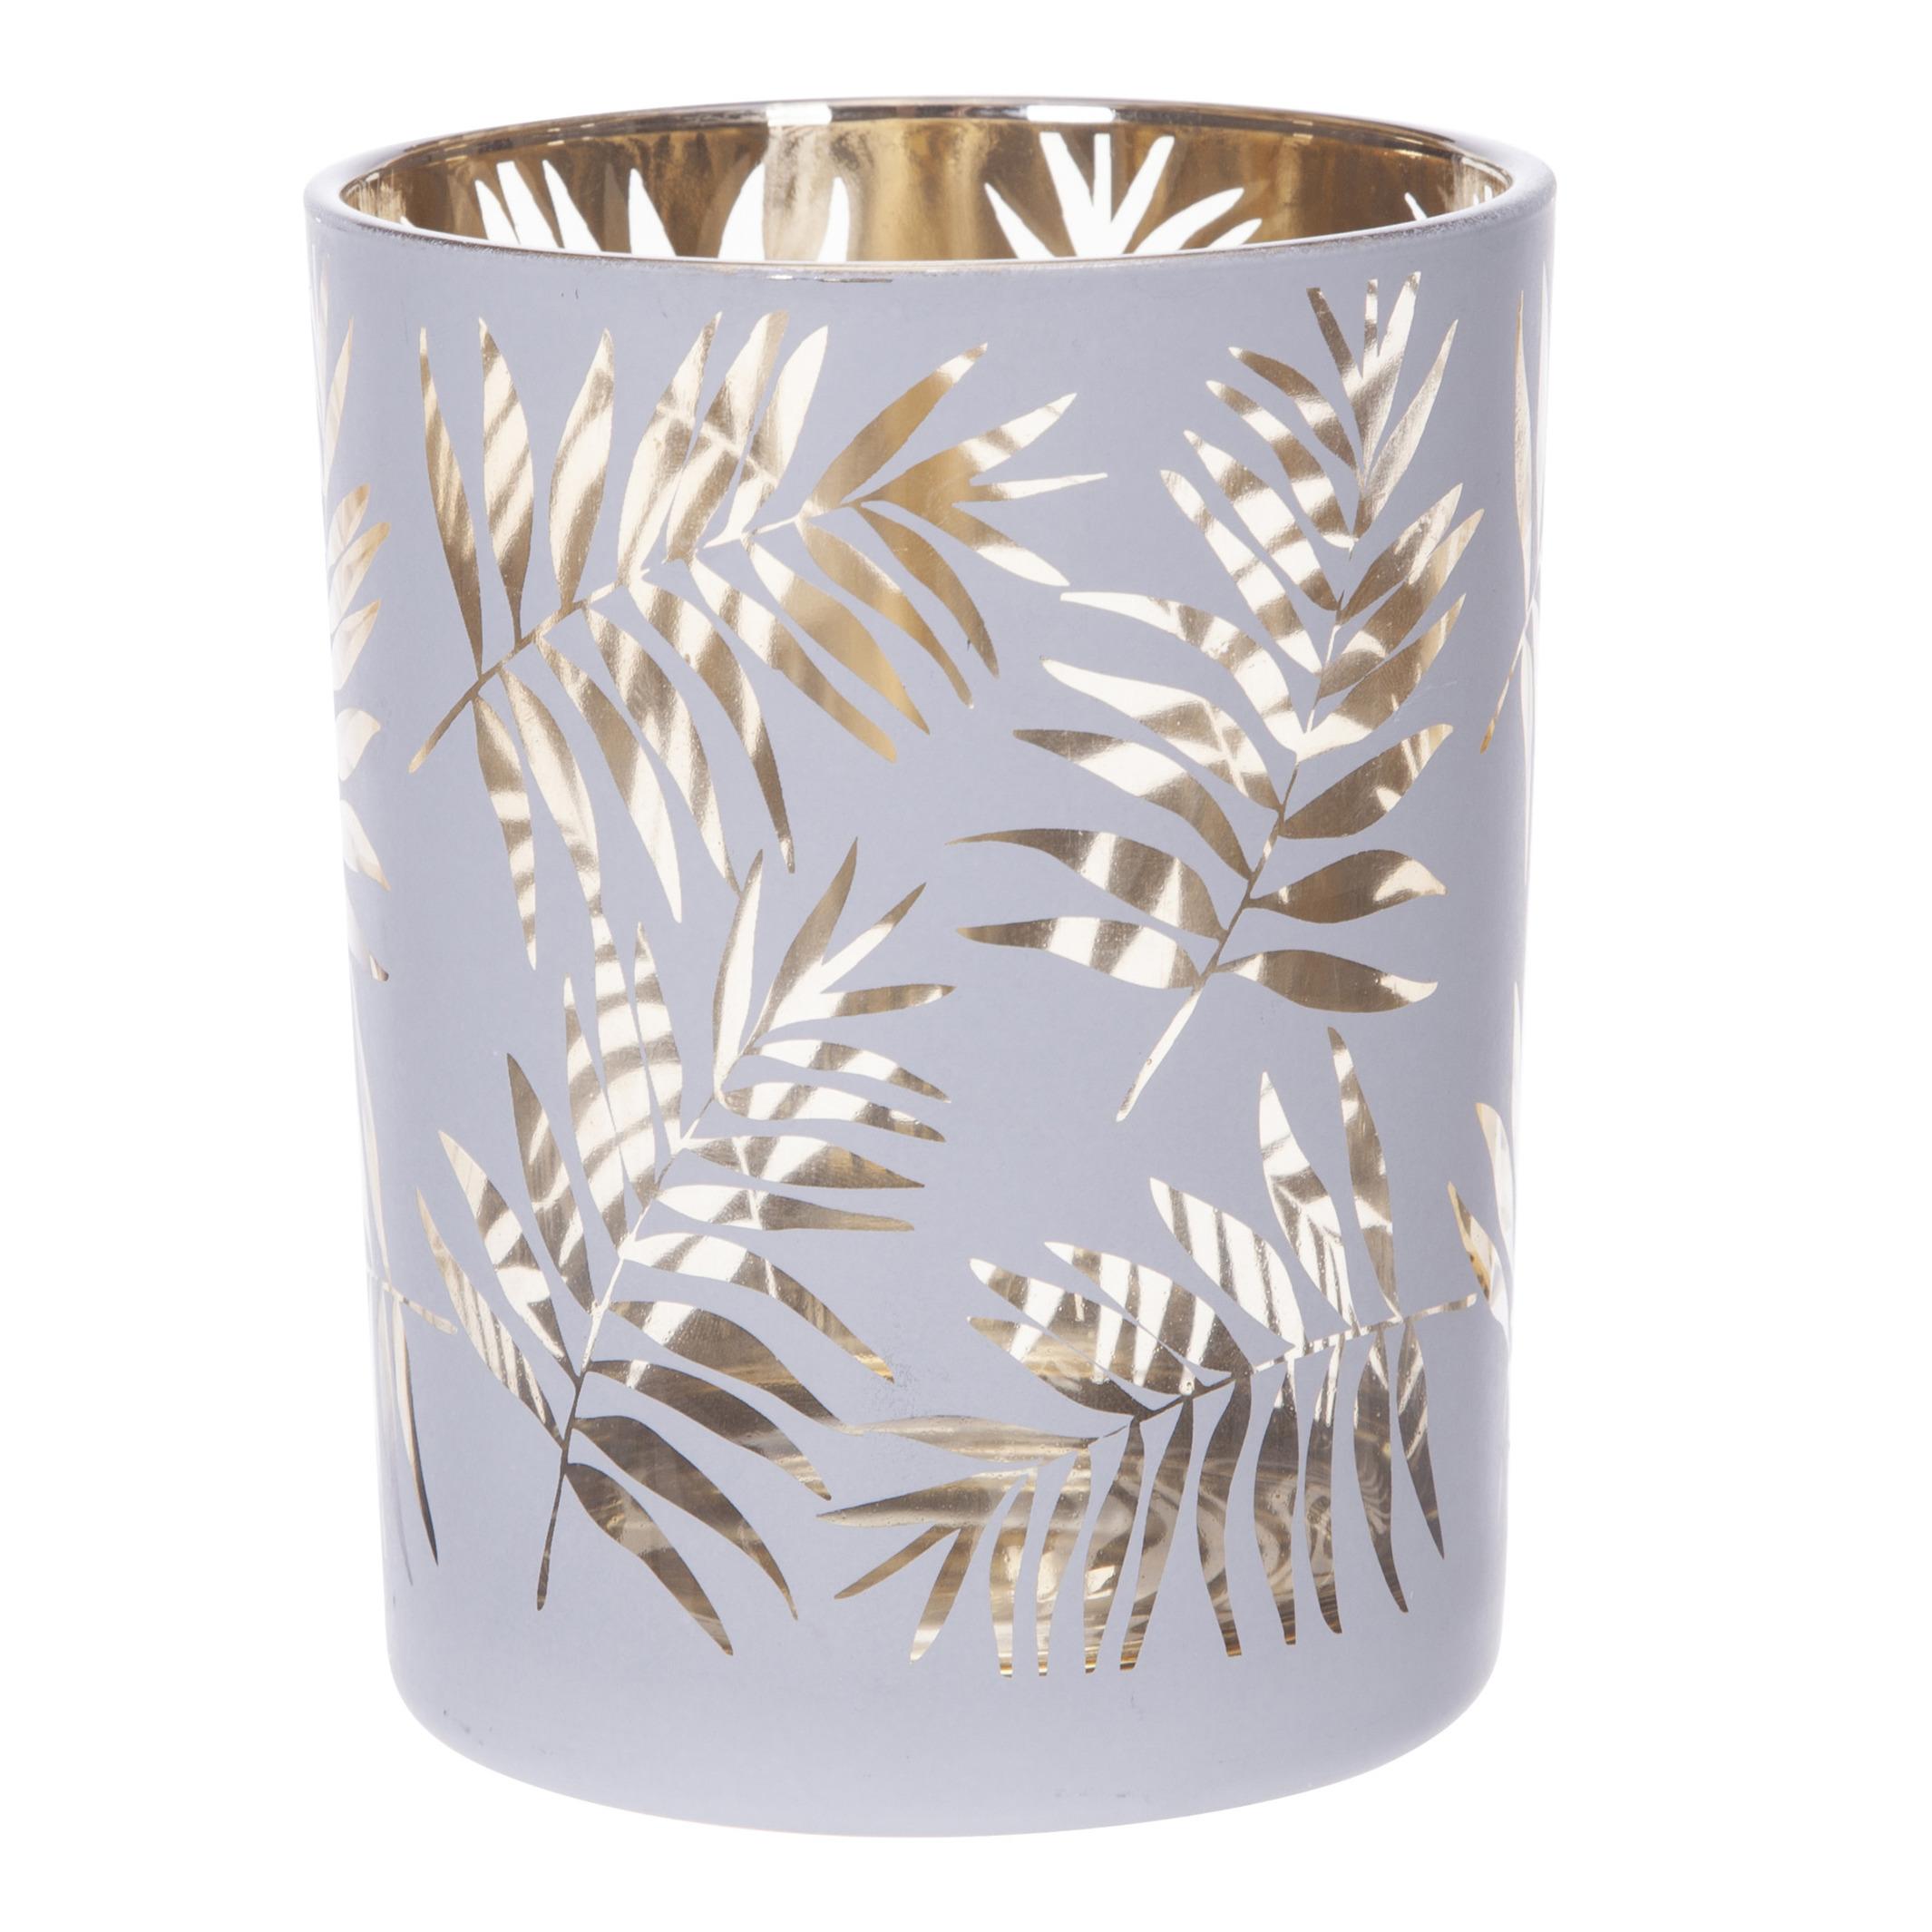 Theelichthouders-waxinelichthouders glas wit-goud bladeren print 12,5 cm